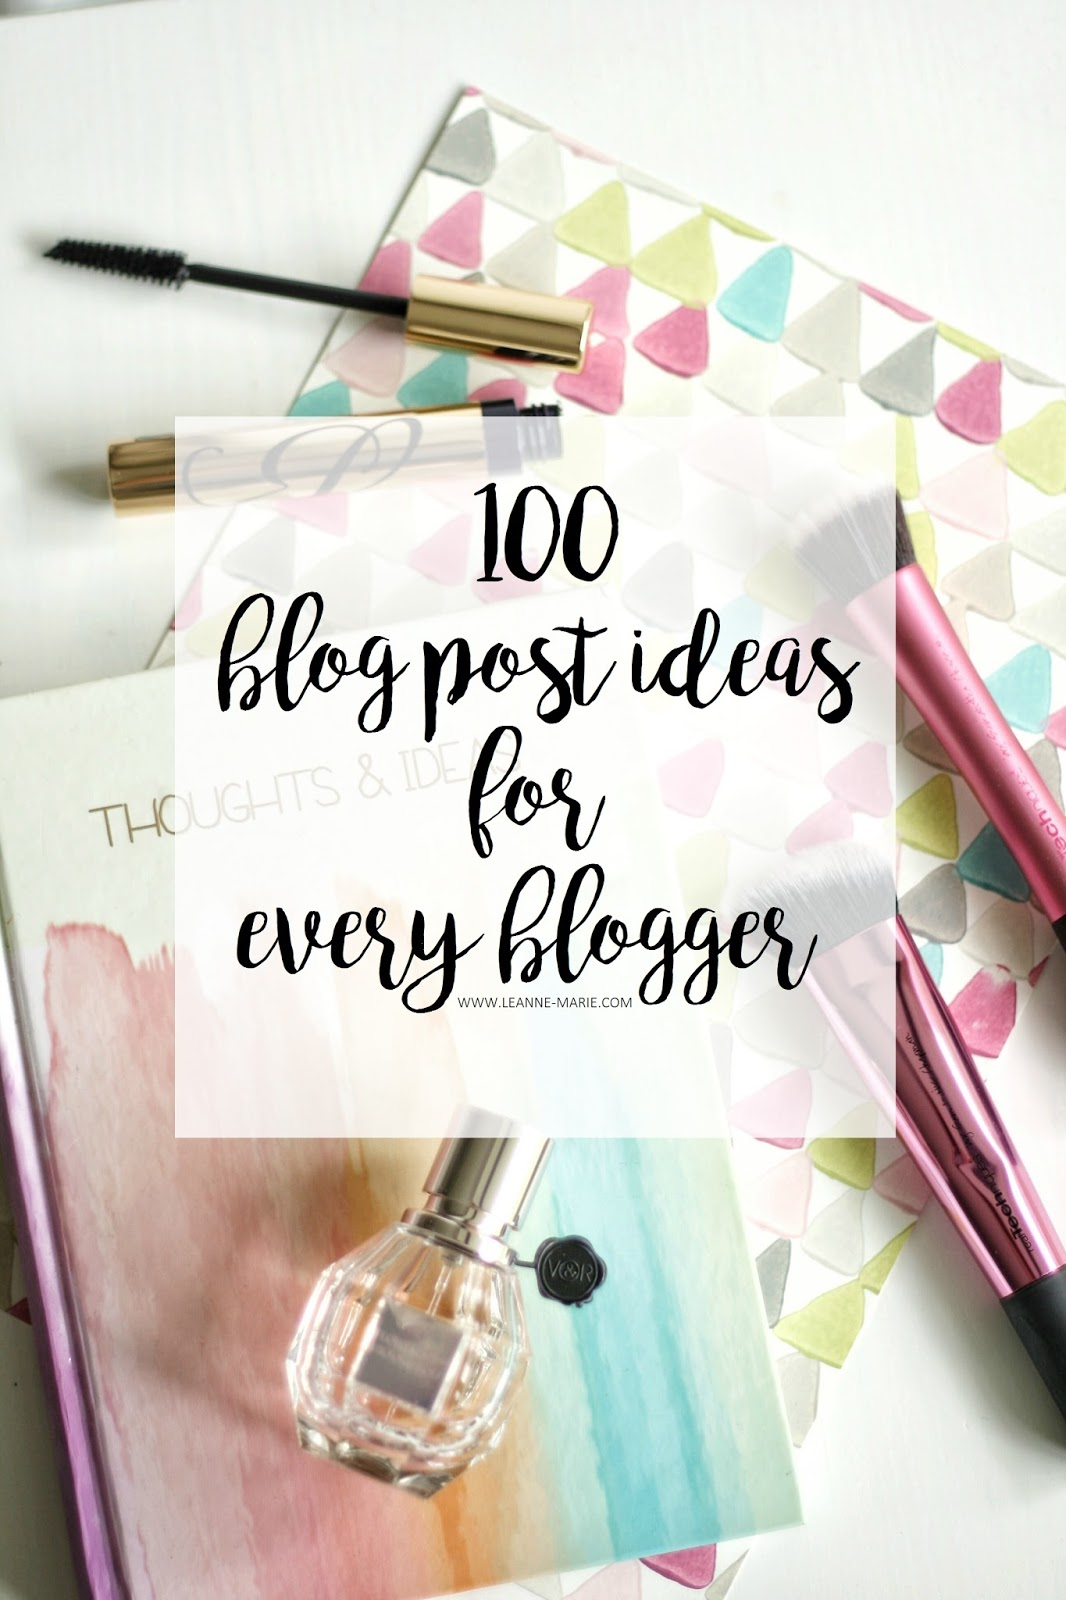 100 BLOG POST IDEAS PINTEREST BLOGGER